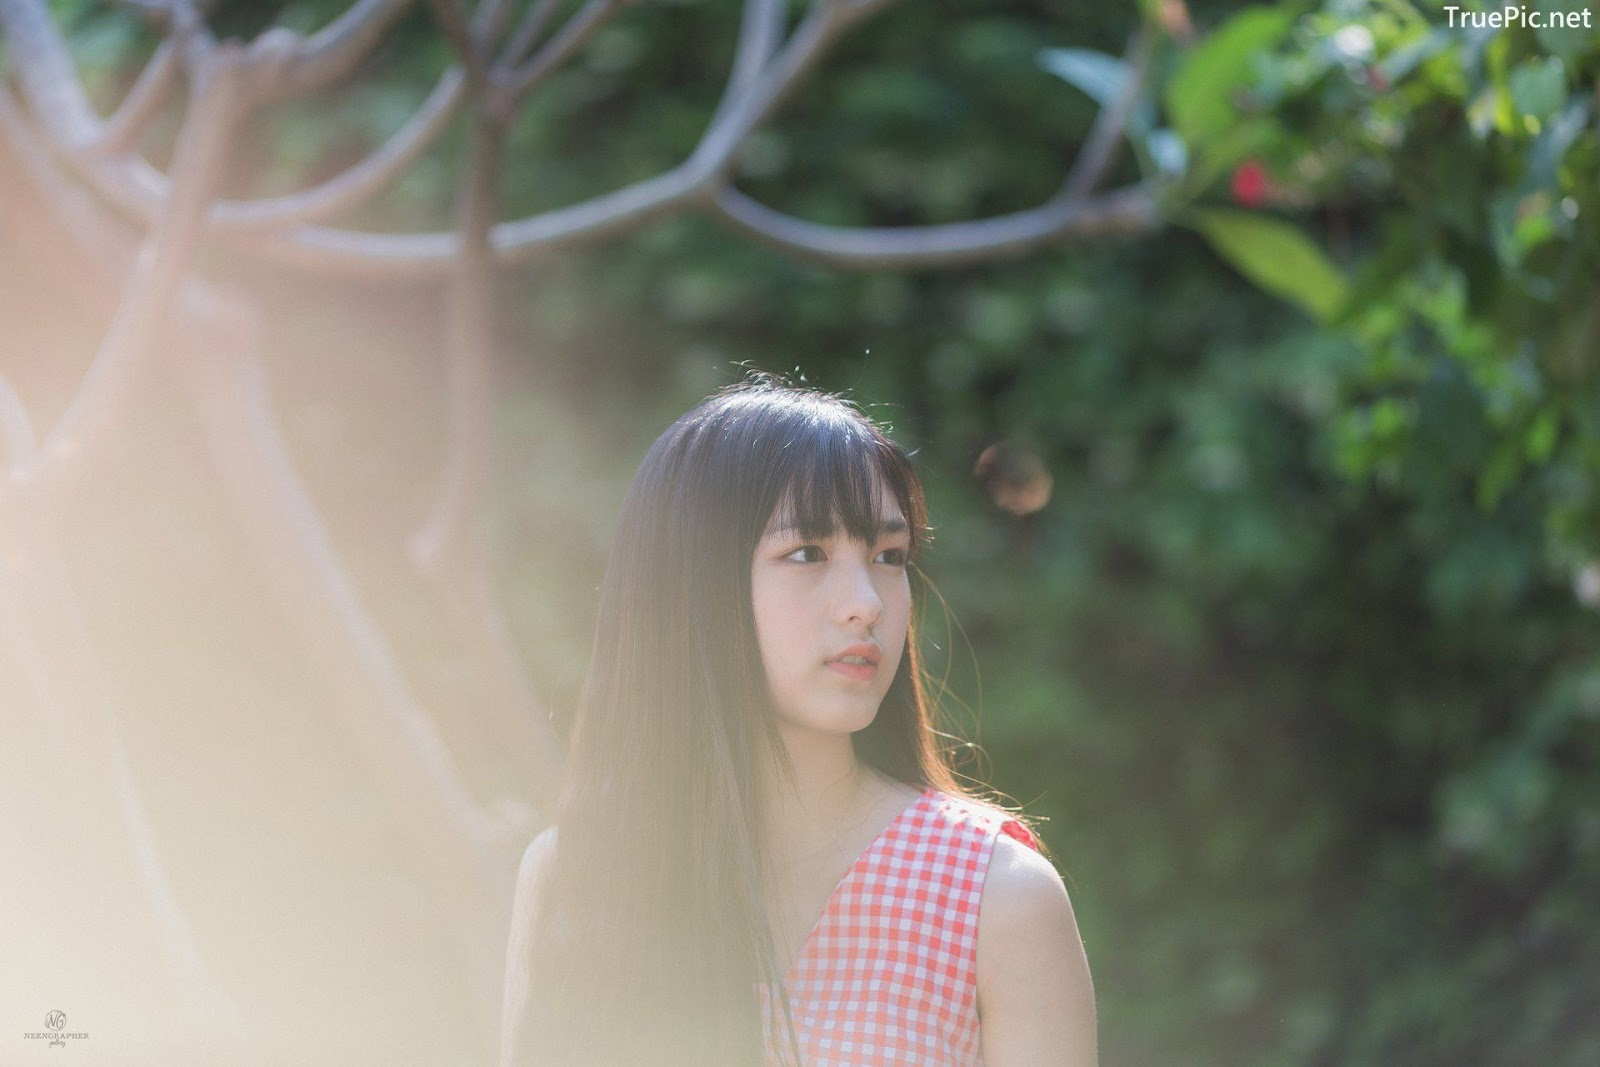 Image-Thailand-Cute-Model-Emma-Panisara–Album-Emma-Bright-Sunday-TruePic.net- Picture-1